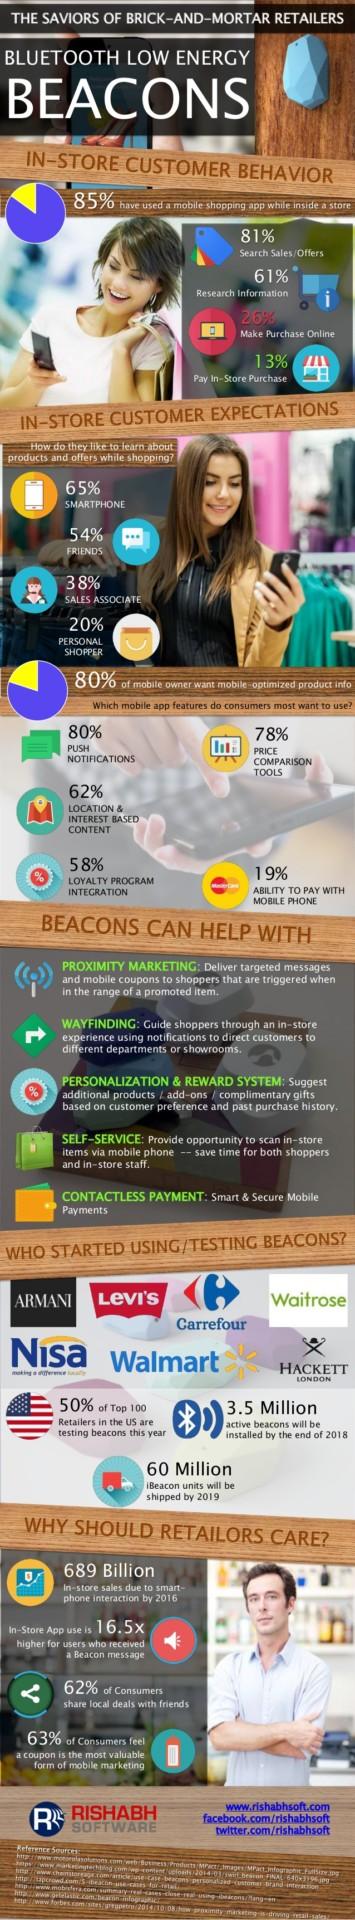 saviors-of-brickandmortar-retailers-ble-beacons-infographic-1-638